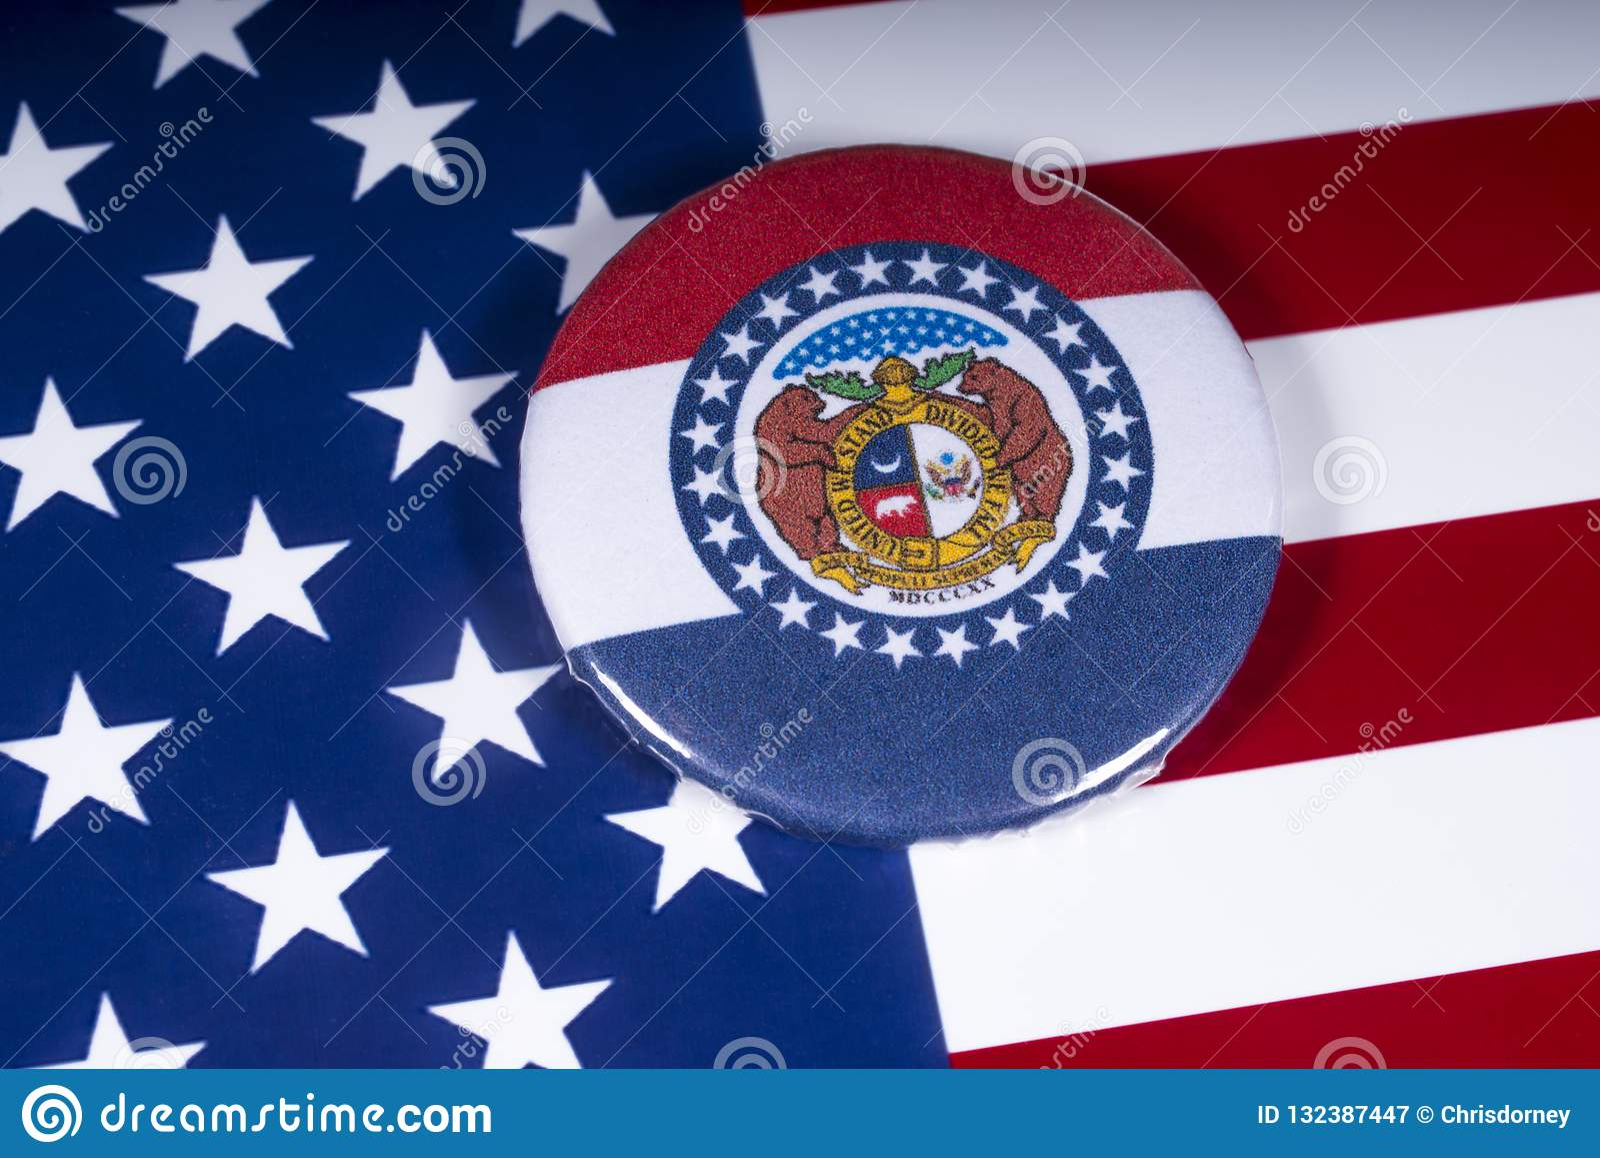 El estado de Missouri en los E.E.U.U.